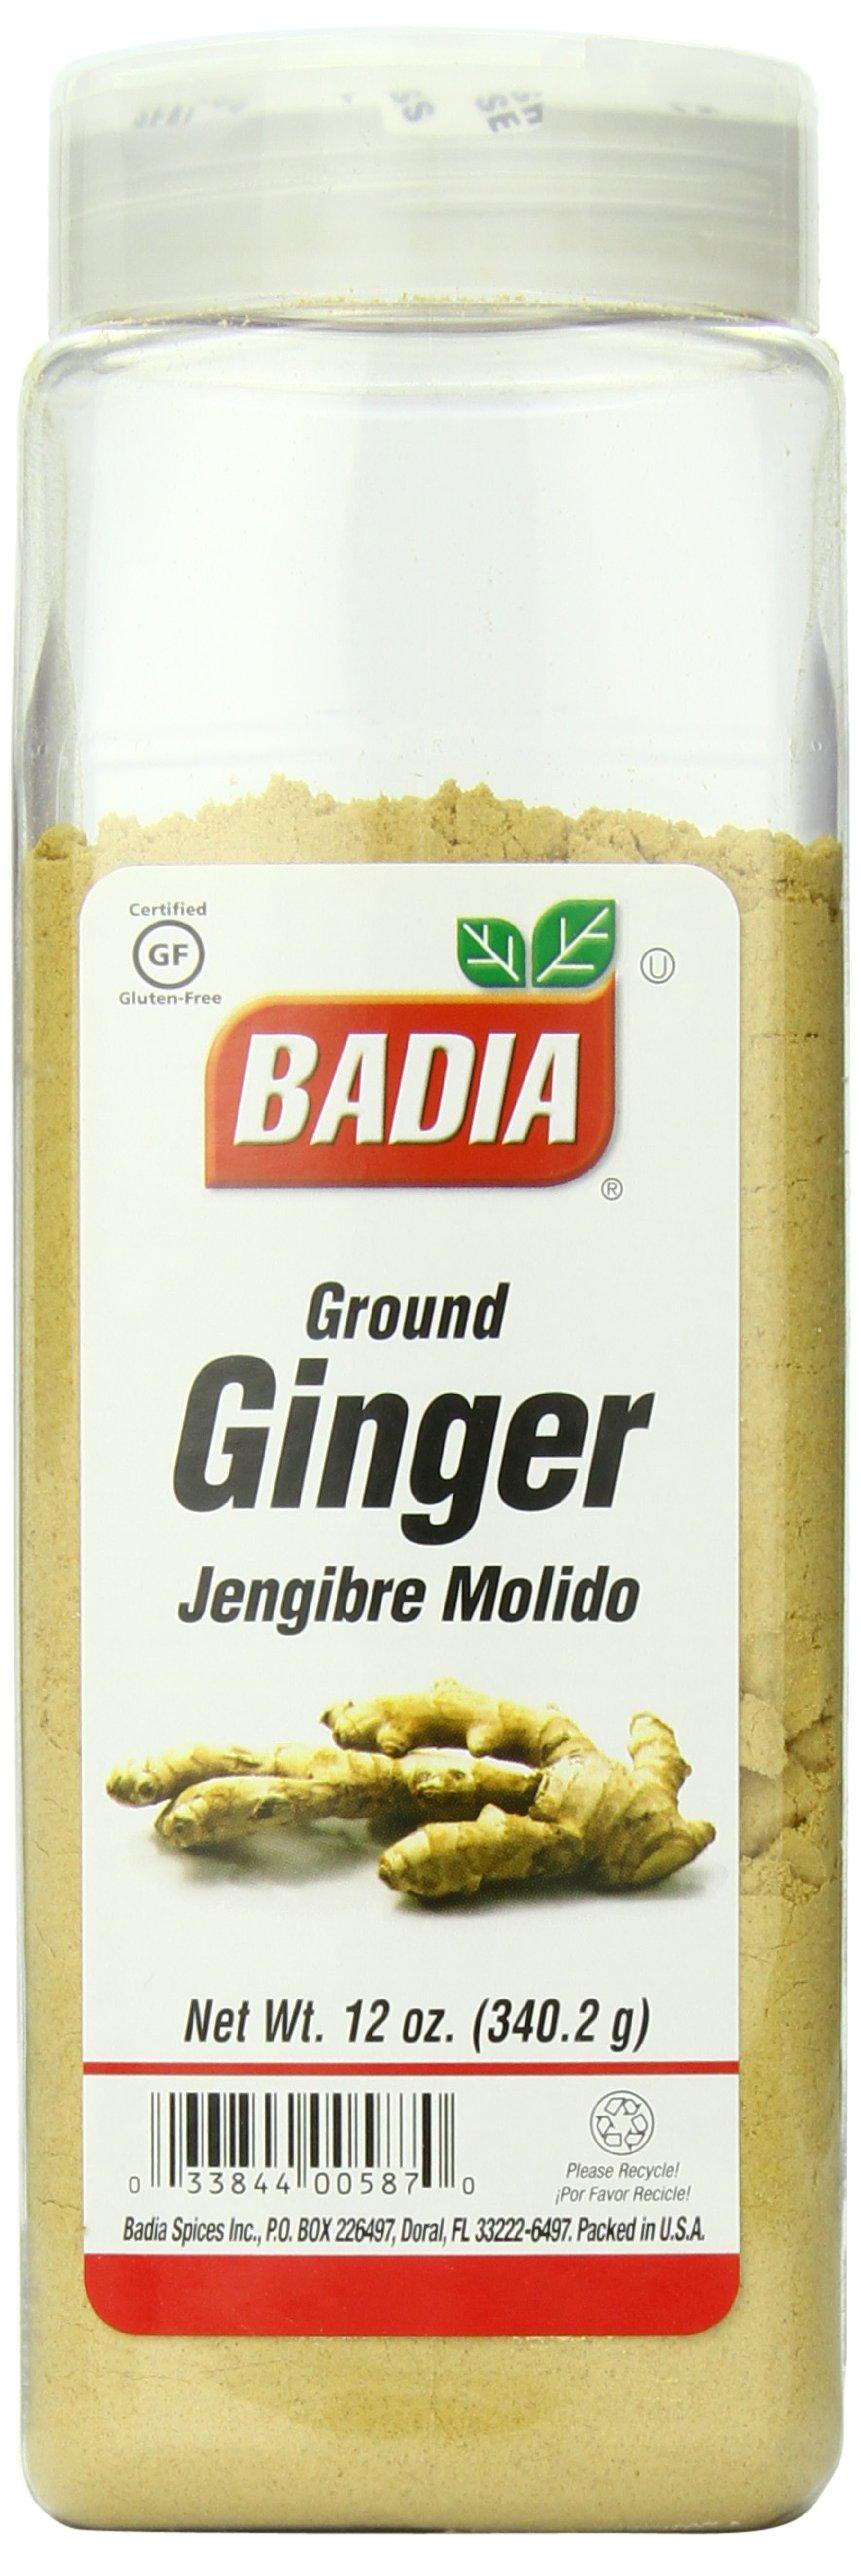 Badia Ginger Ground, 12 Ounce (Pack of 6)